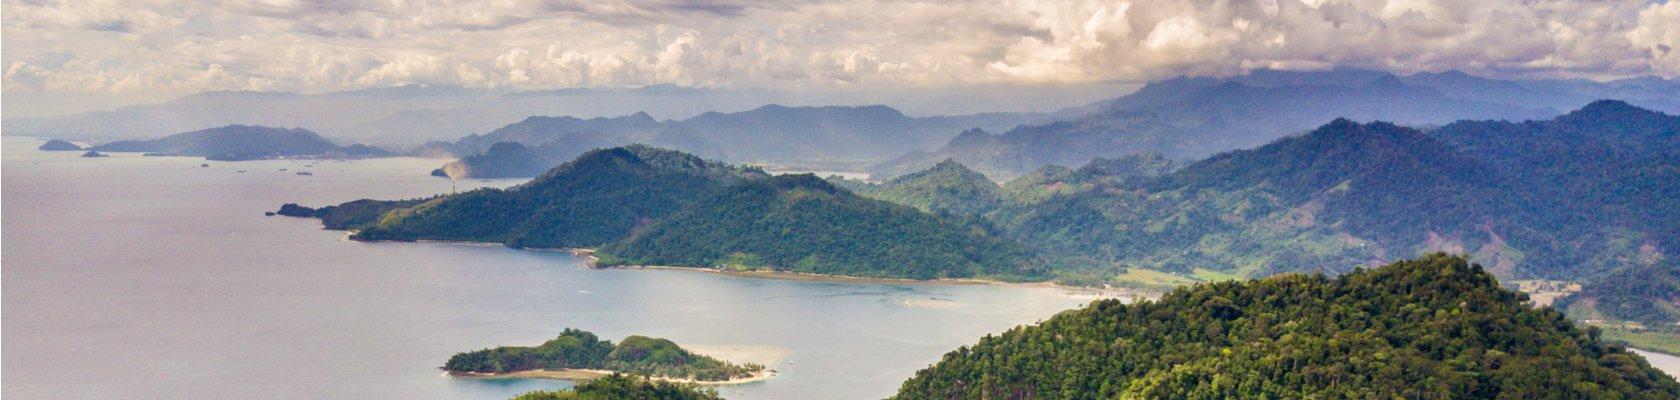 kust van West-Sumatra